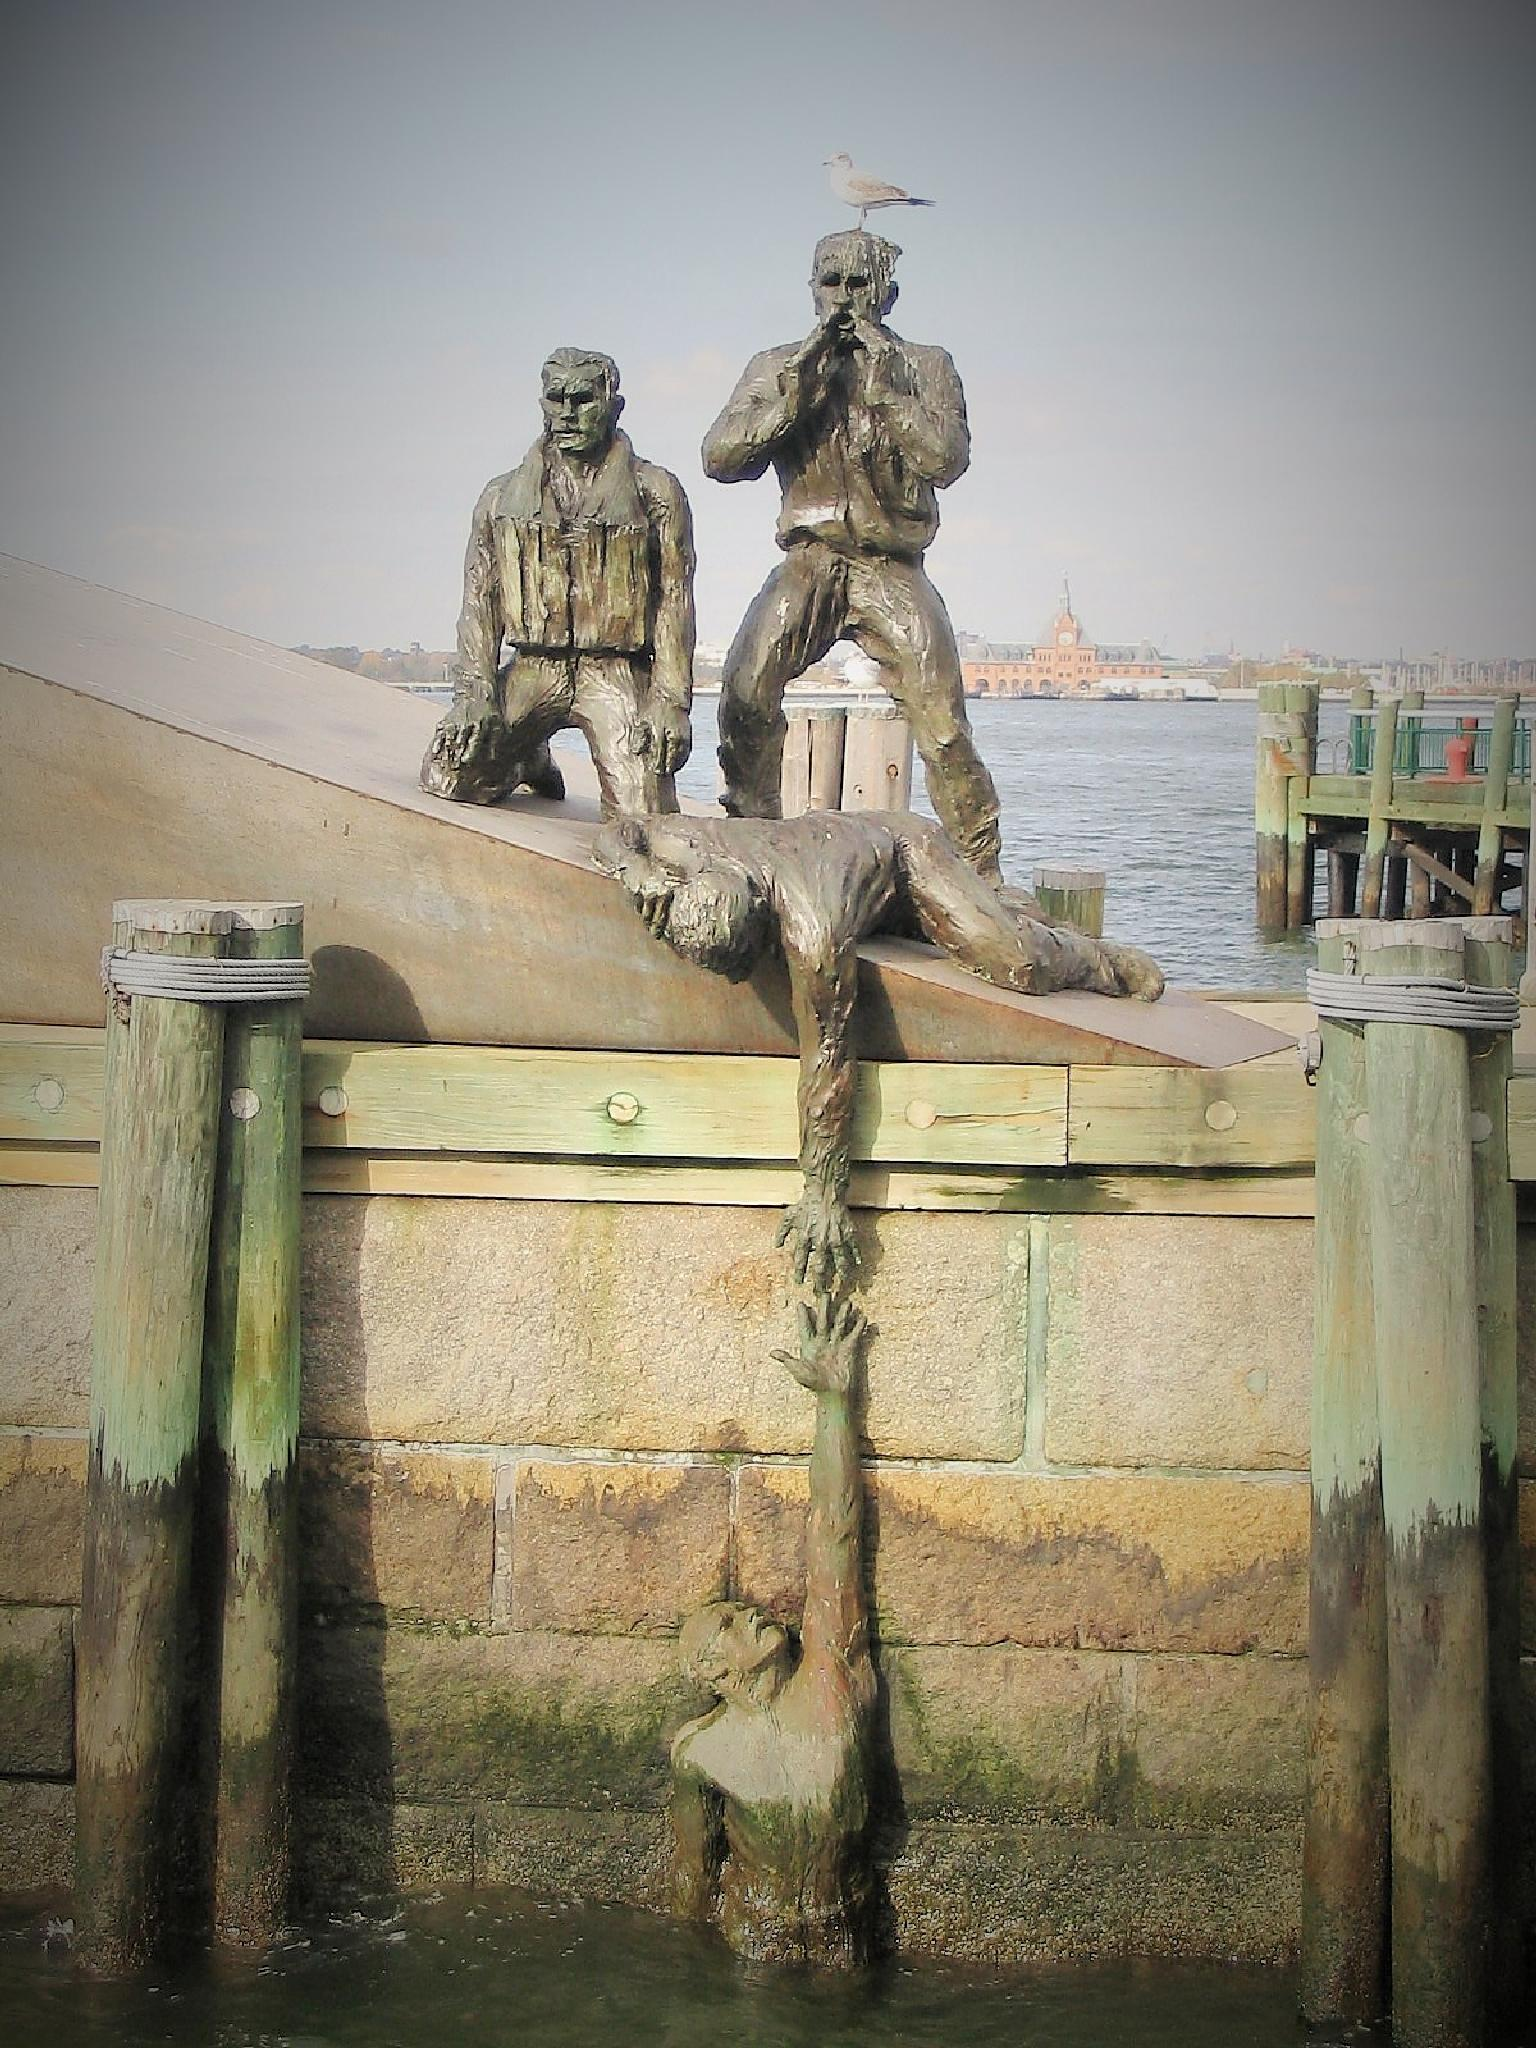 American Merchant Mariners Memorial by silviosteinhaus